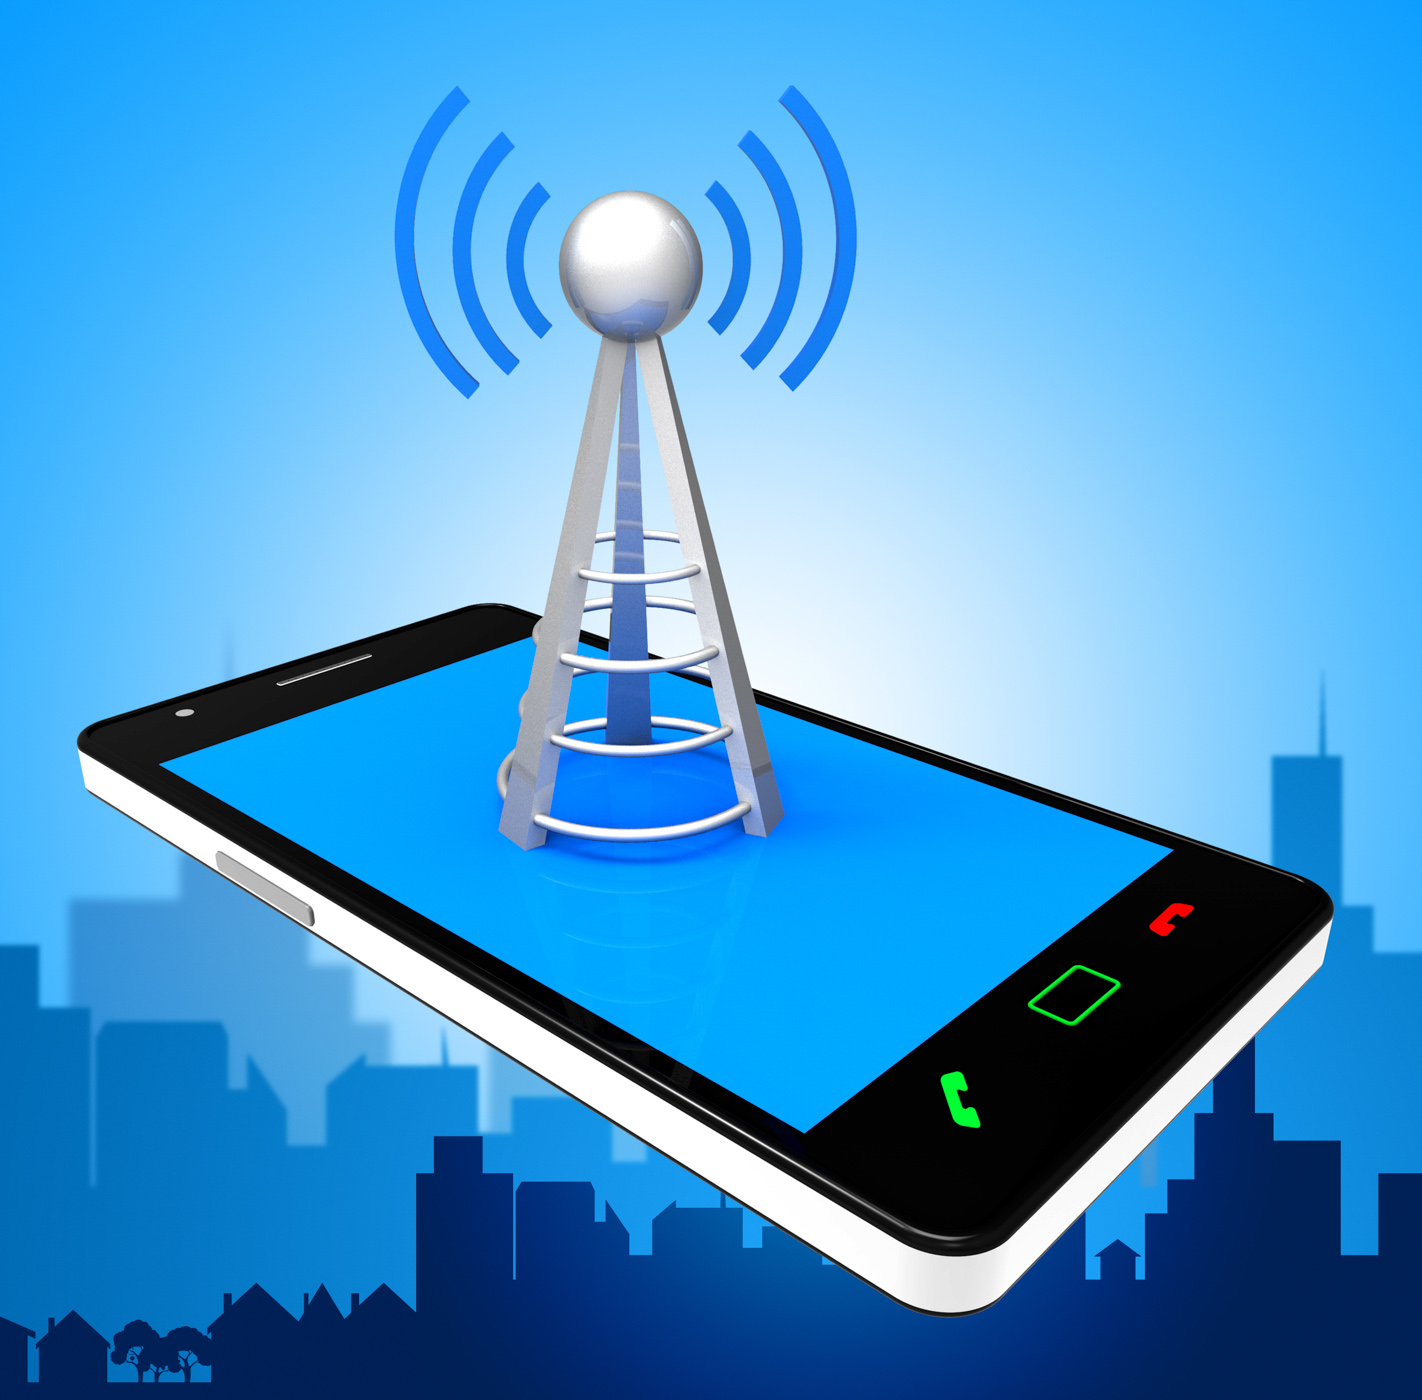 Smartphone wifi indicates world wide web and antenna photo